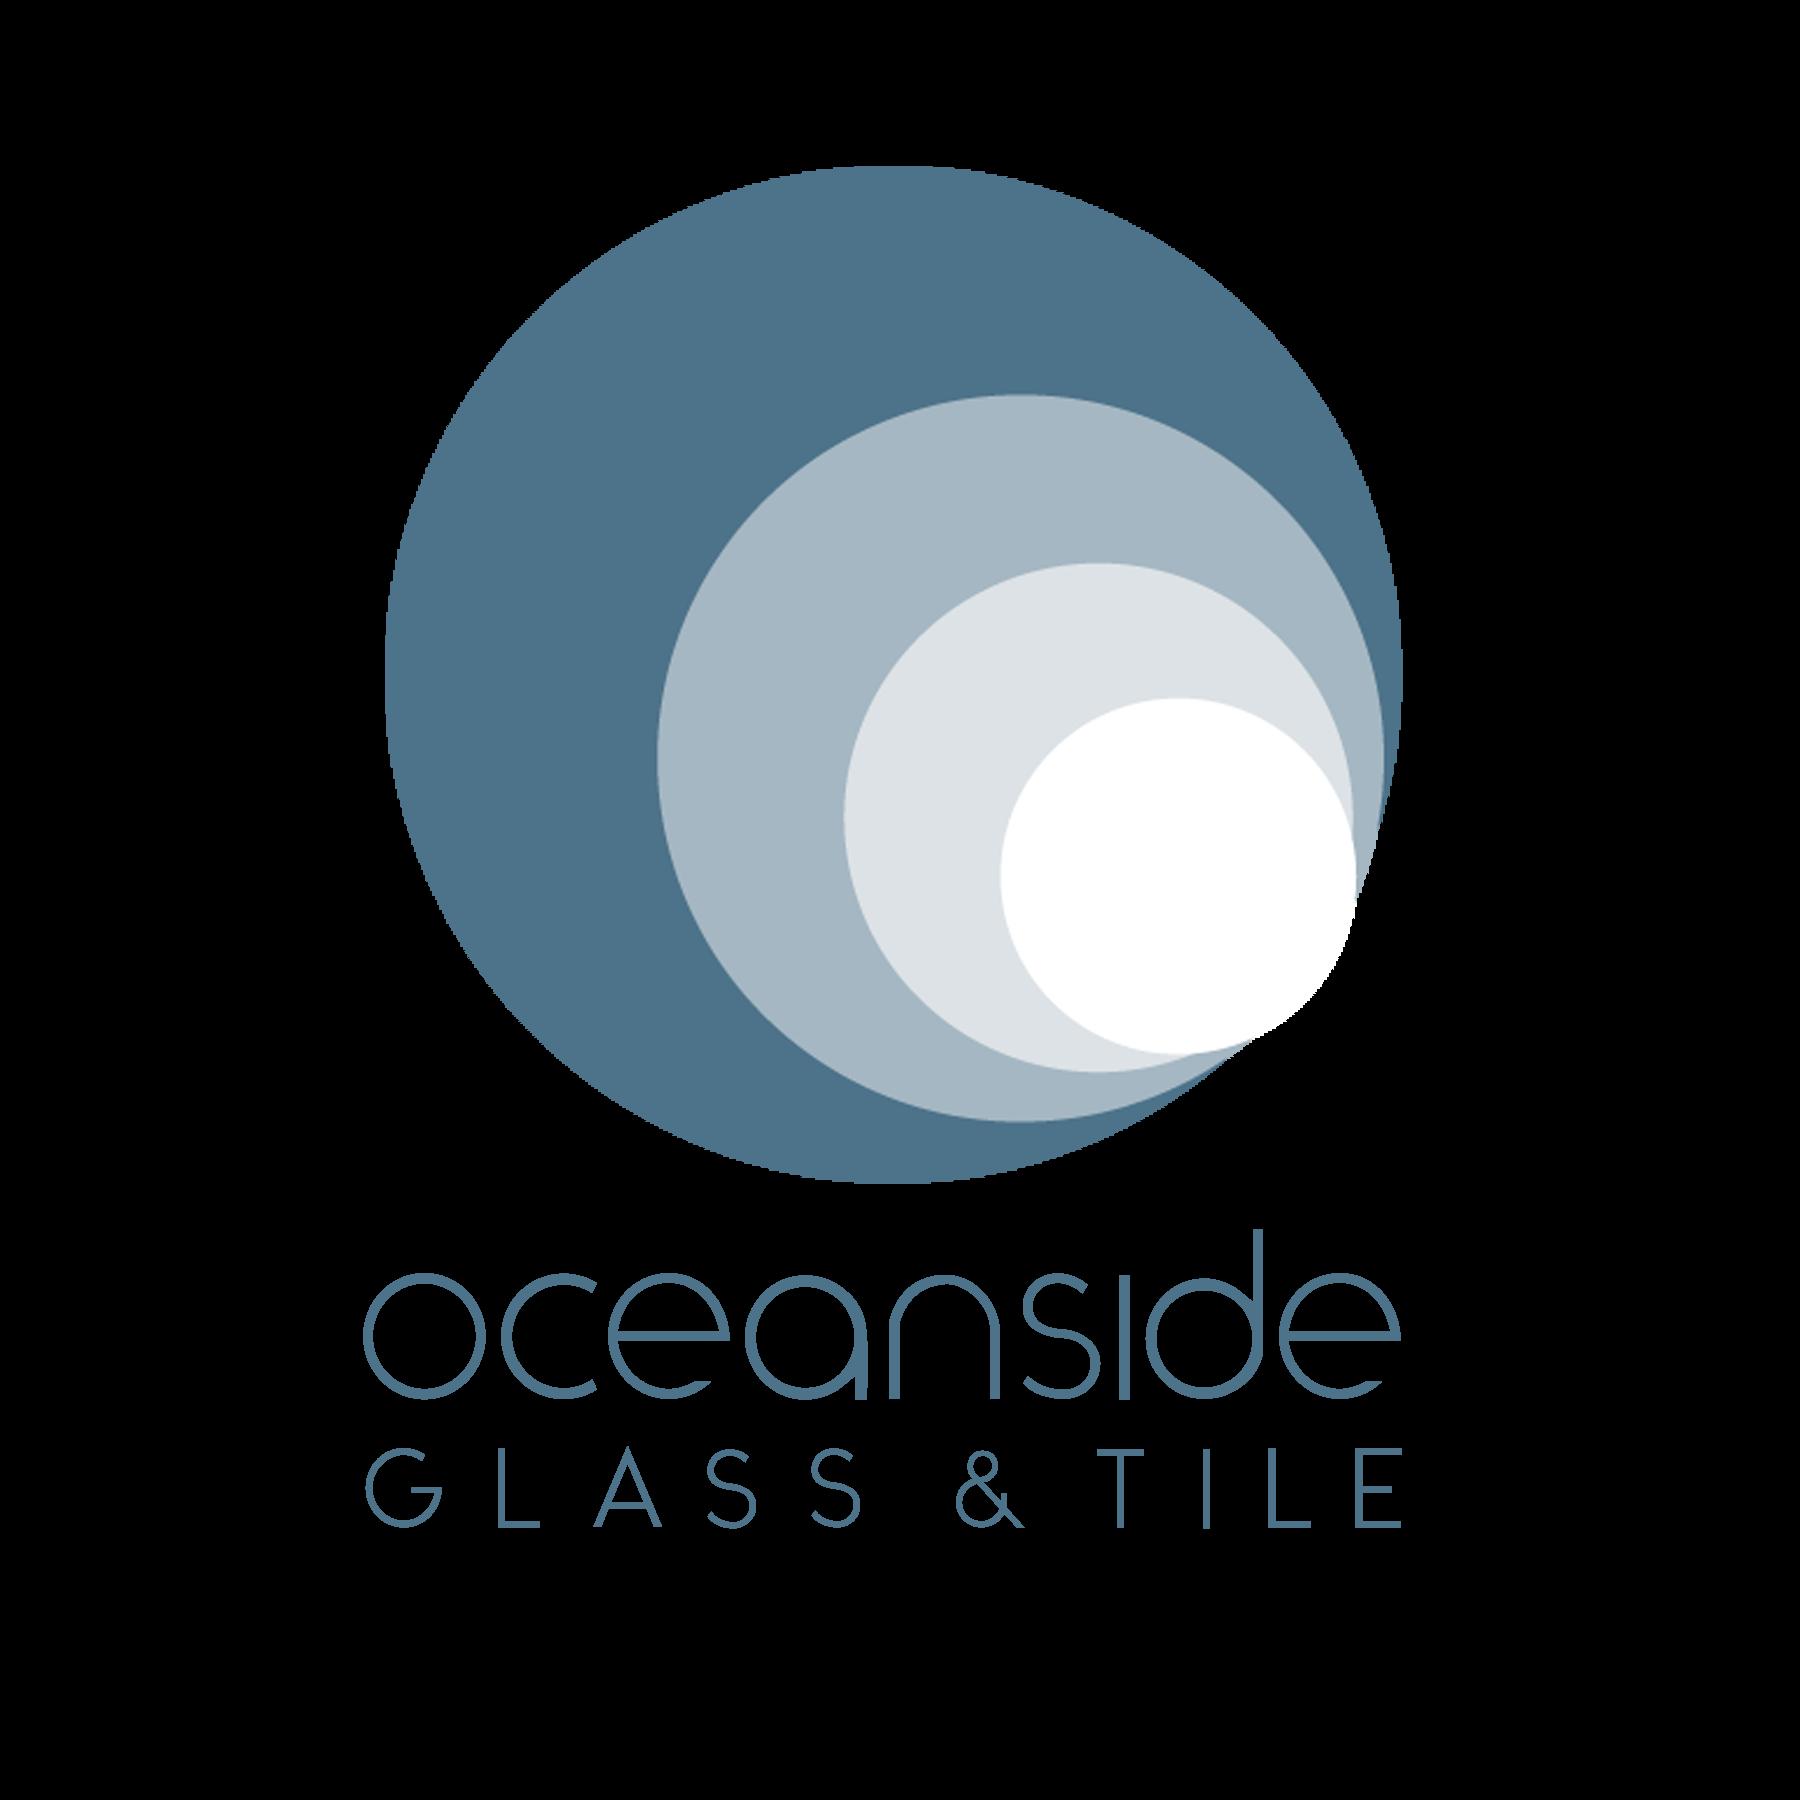 Oceanside_Glass_Tile_Logo_Vertical.png